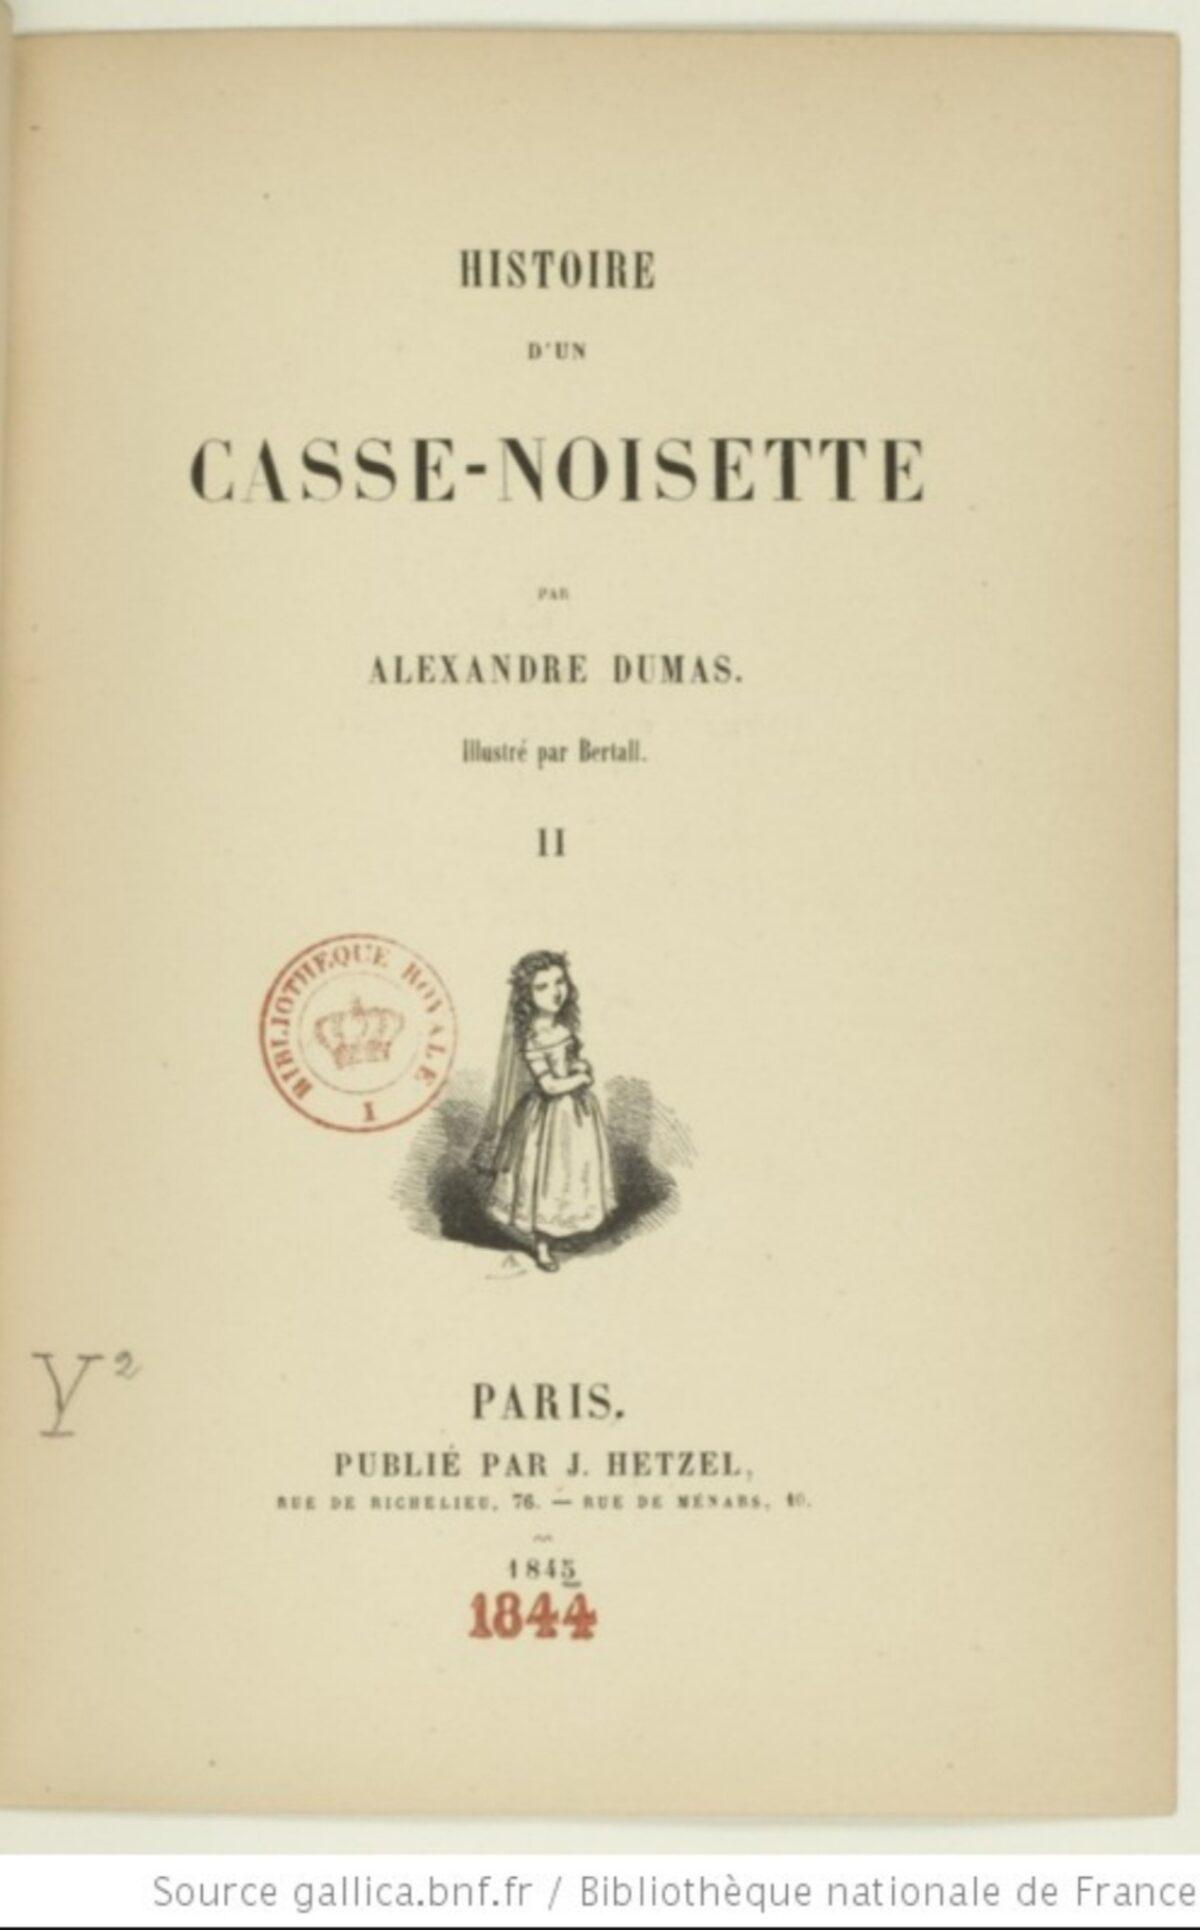 Mio caro fumetto... - Histoire d'un casse-noisette di Alexandre Dumas